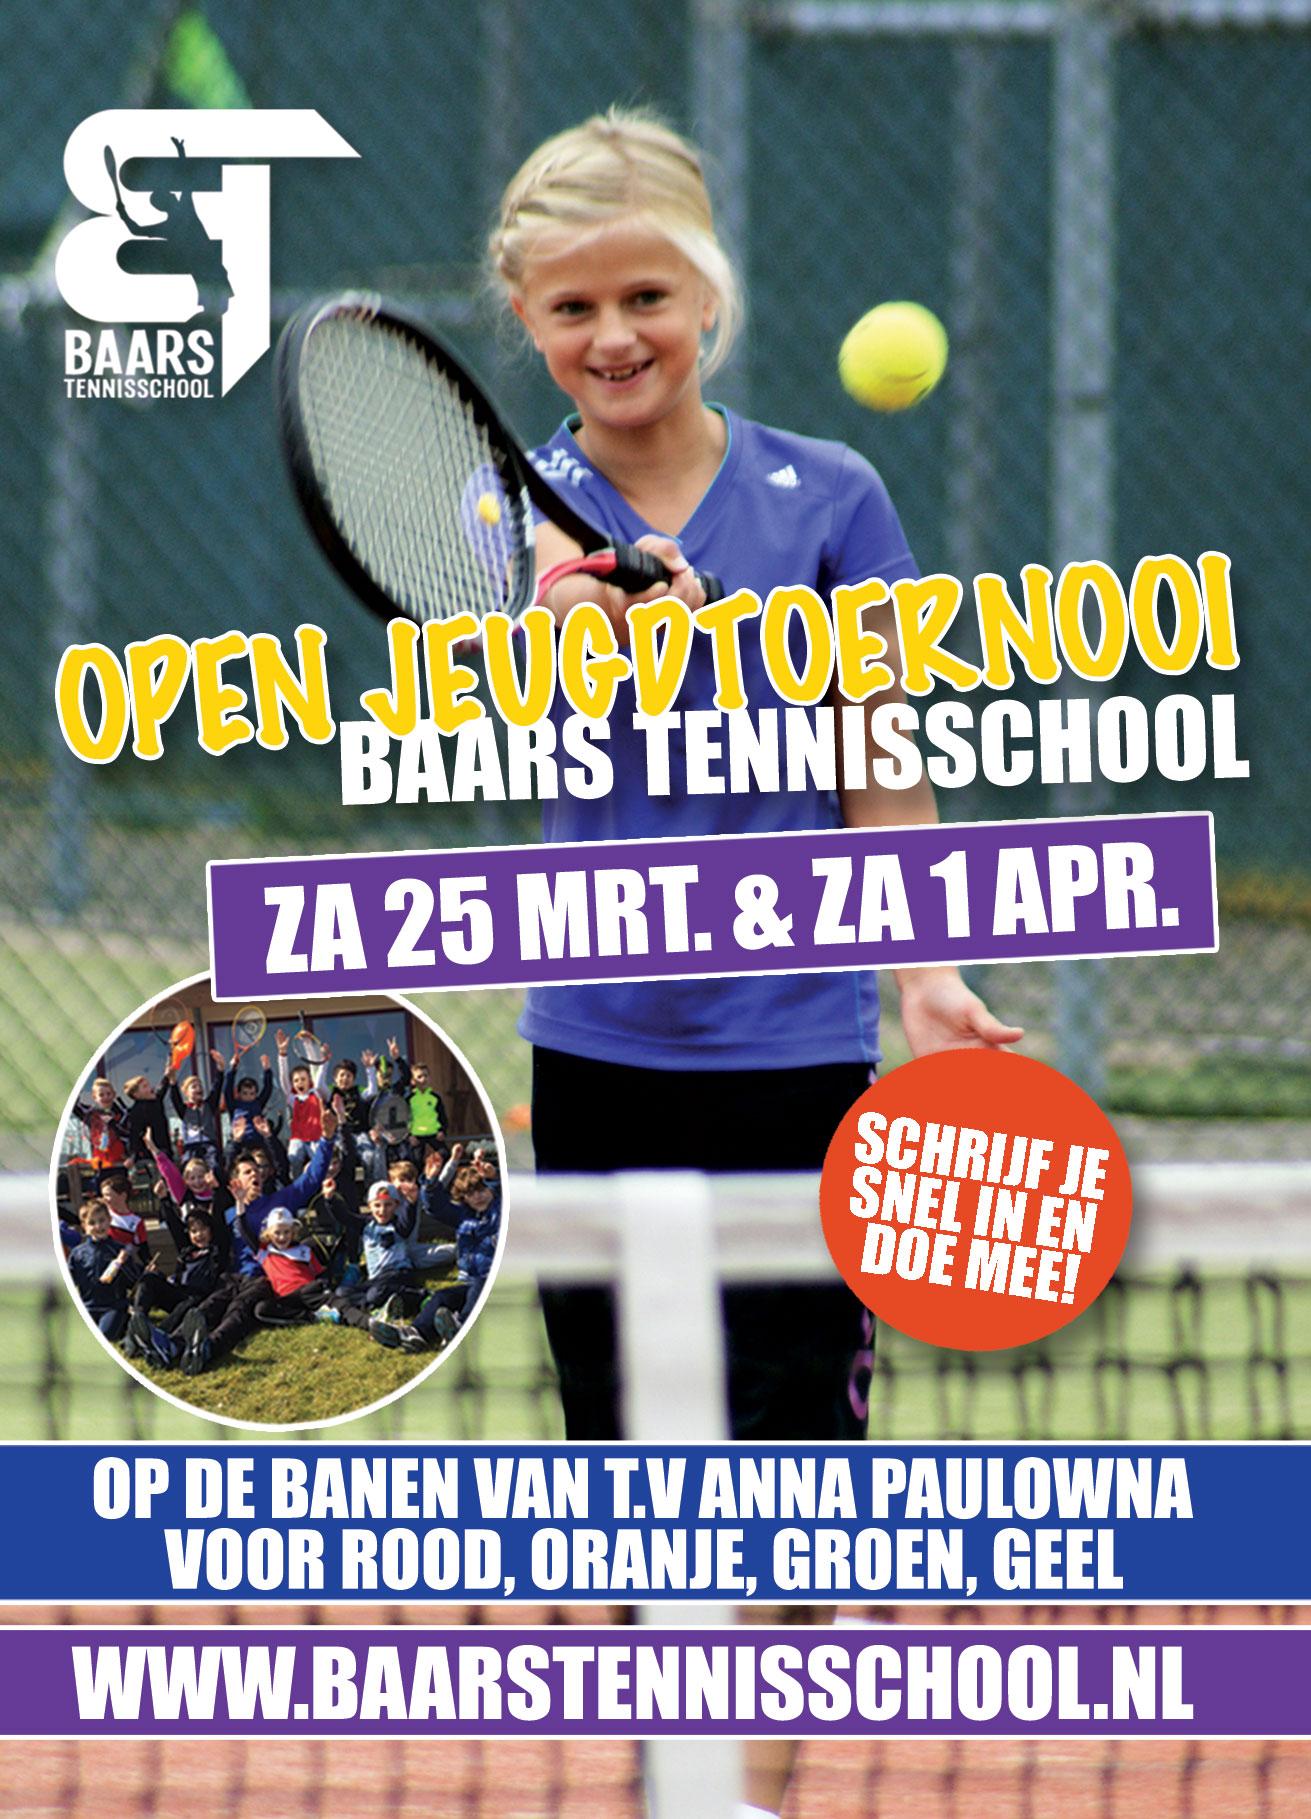 Flyer Open Jeugdtoernooi Baars Tennisschool 2017